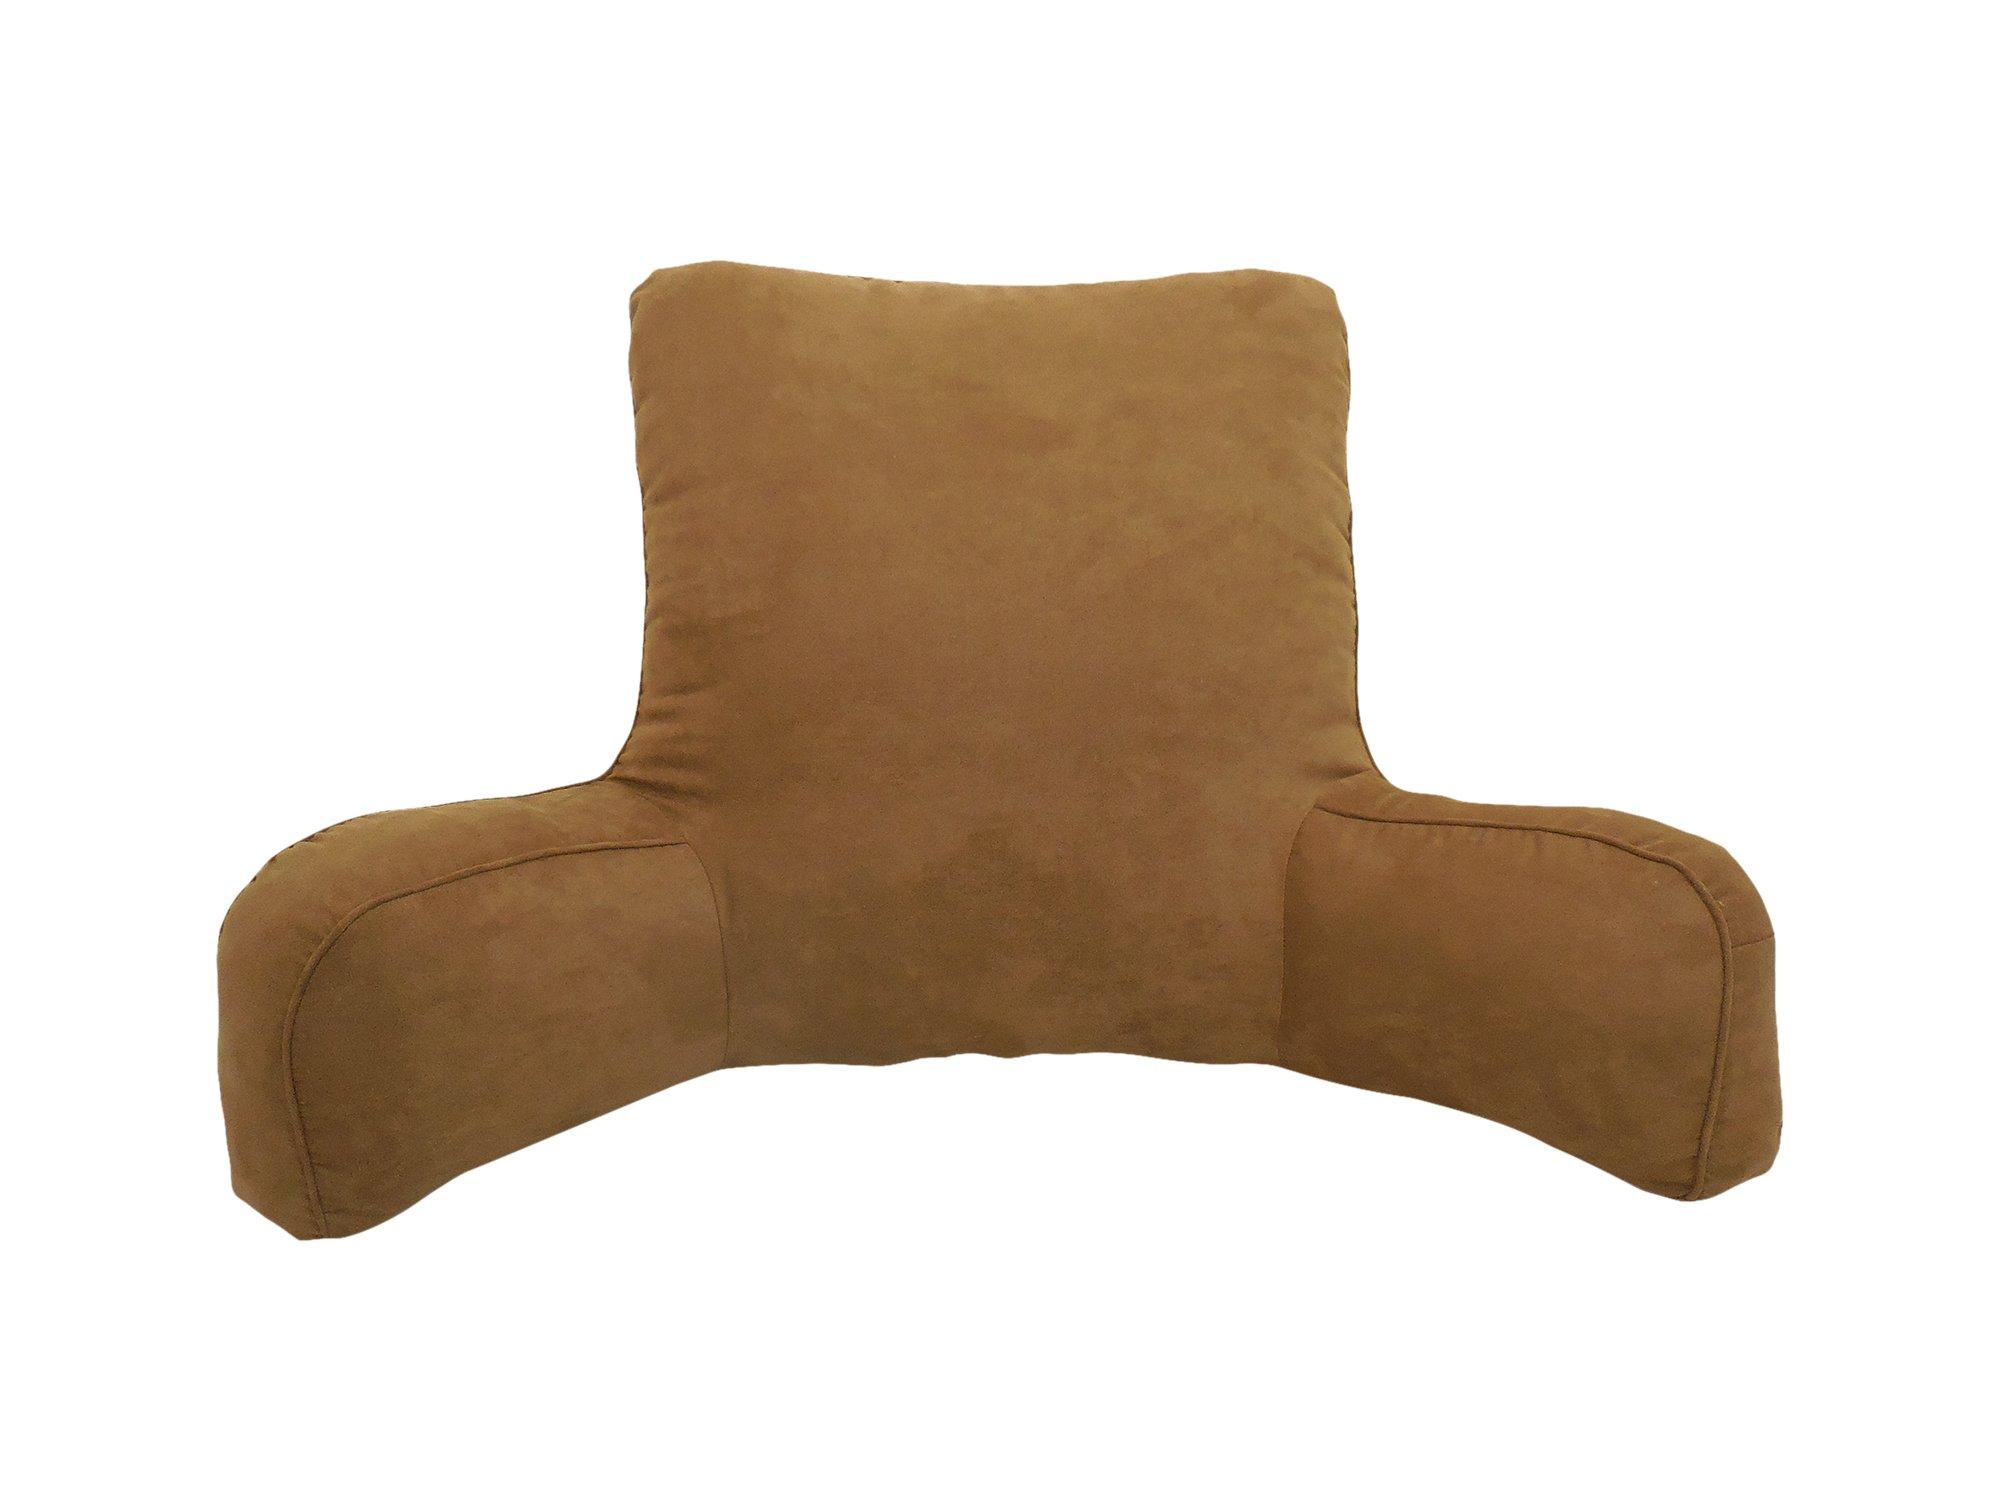 Arlee Suede Oversized Bedrest Lounger, Dachshund